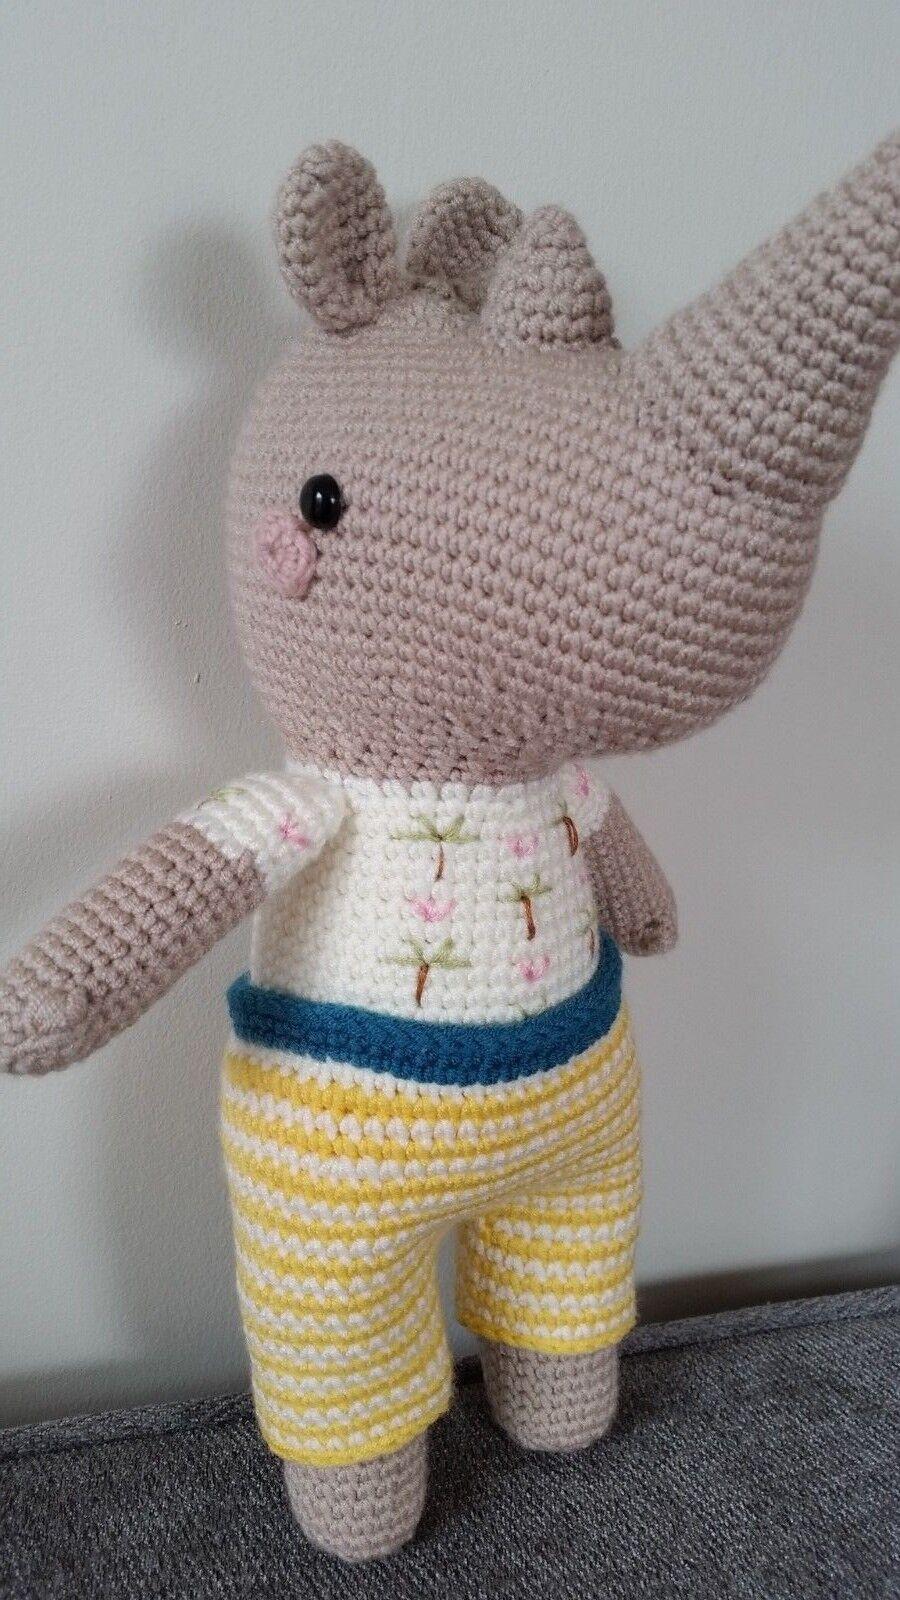 Rhino Hector Hand Made Crochet Soft Toy Rhinoceros